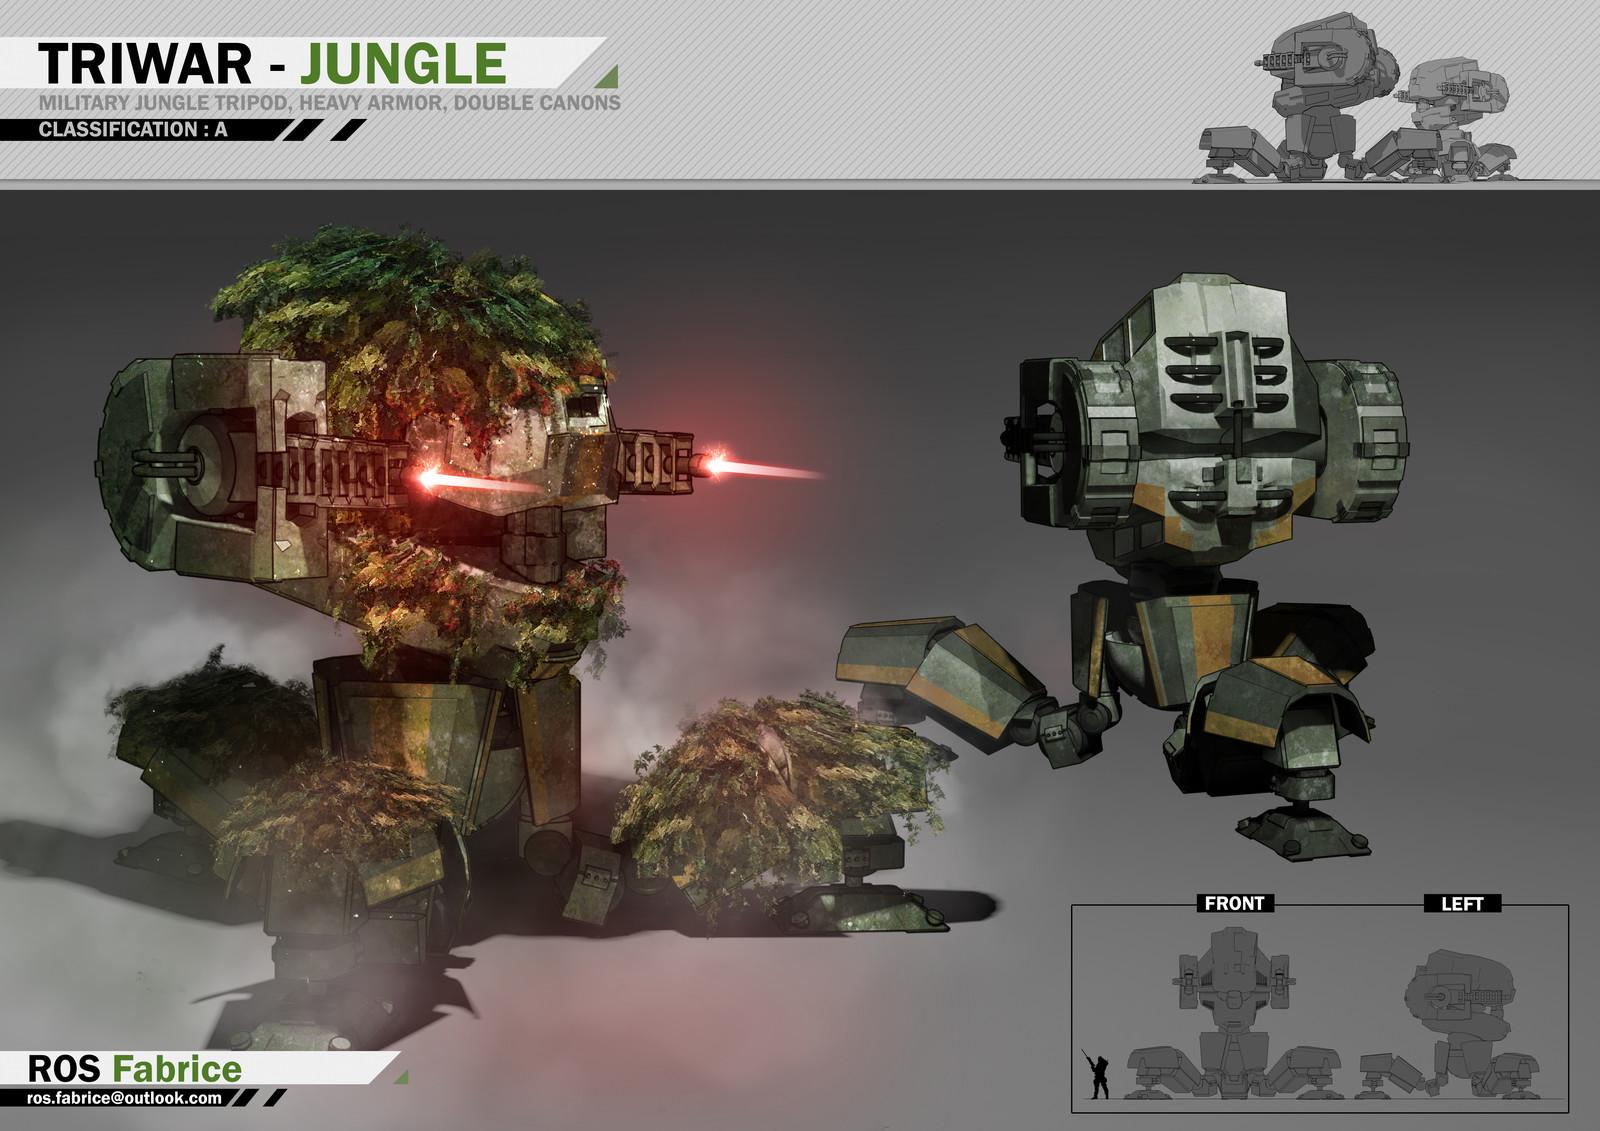 The Triwar - Jungle